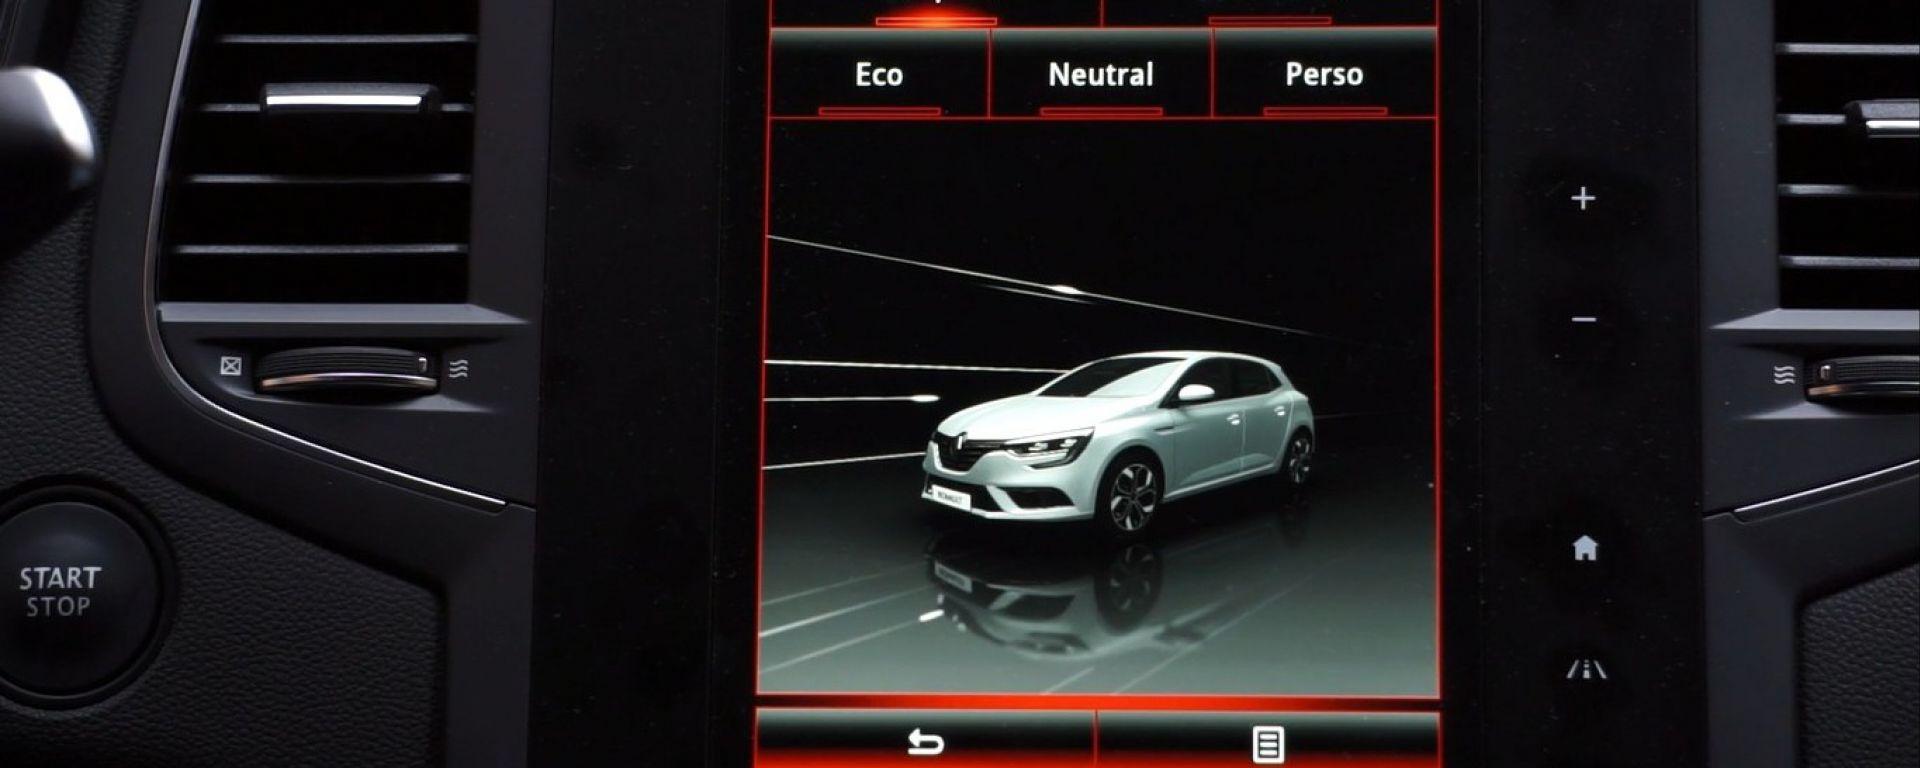 Renault Mègane 2016: la prova dell'infotainment